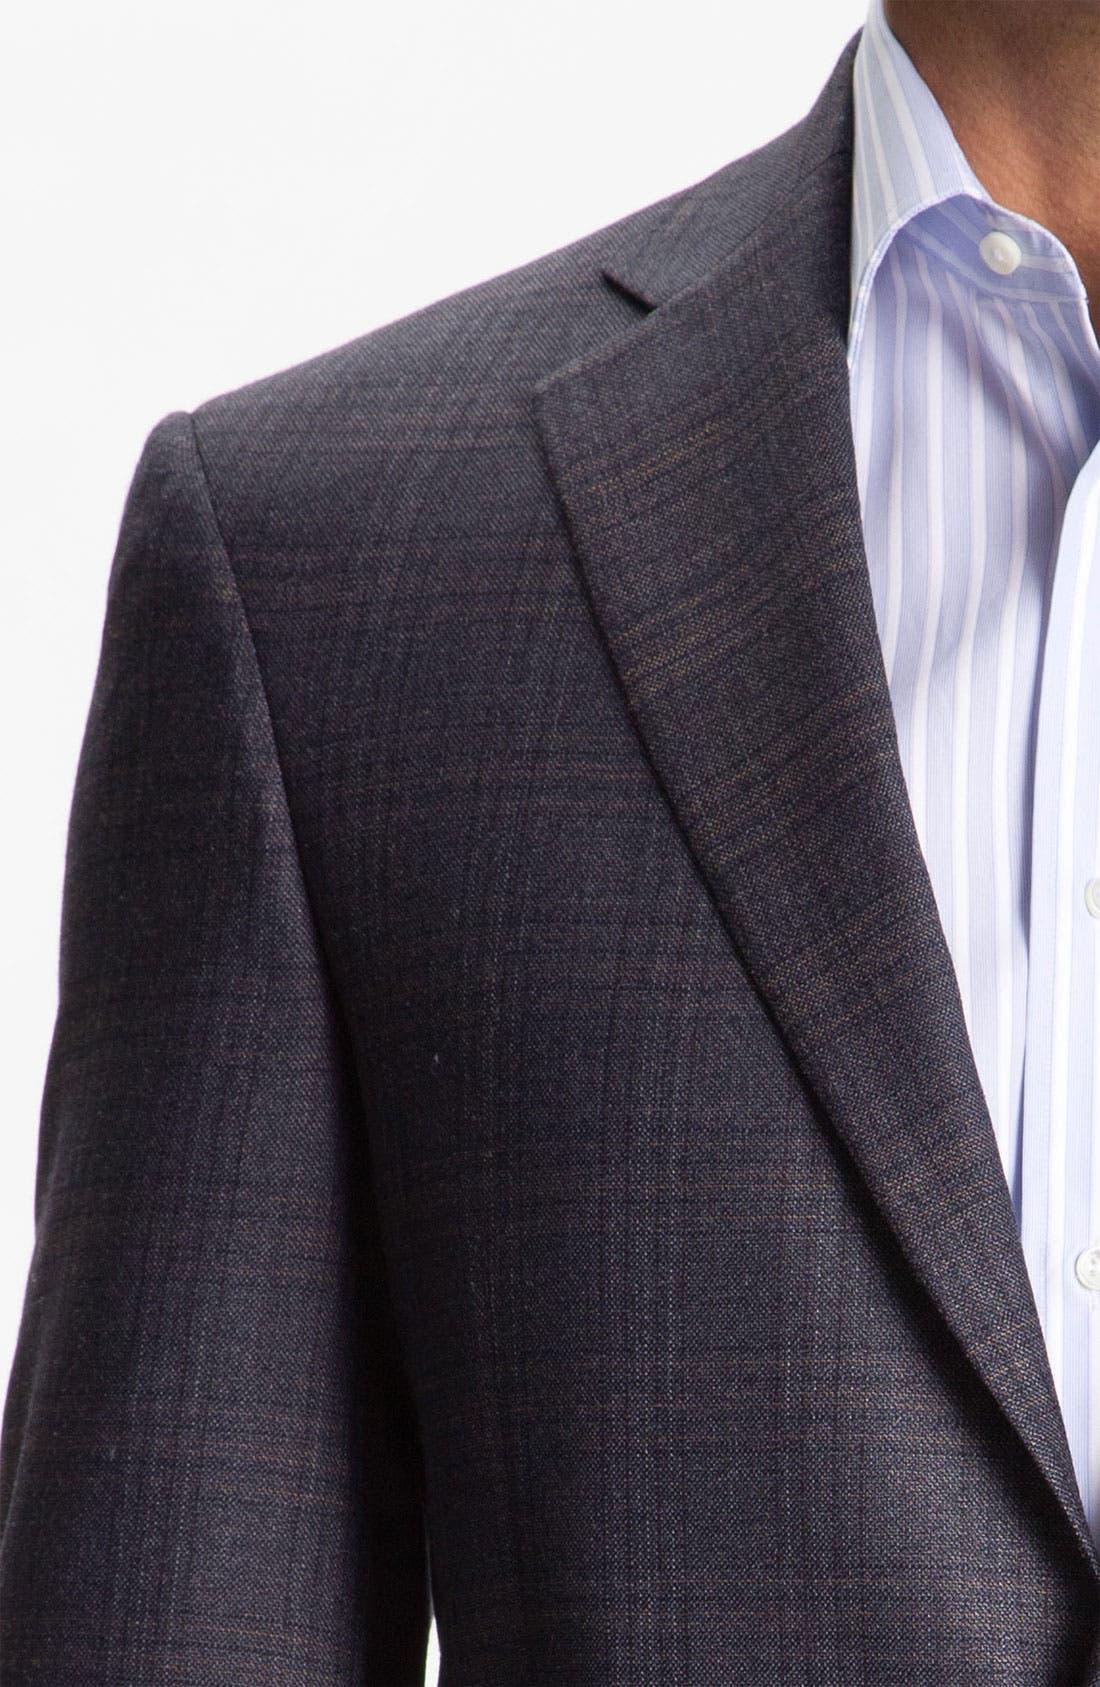 HART SCHAFFNER MARX, Plaid Sportcoat, Alternate thumbnail 3, color, 401